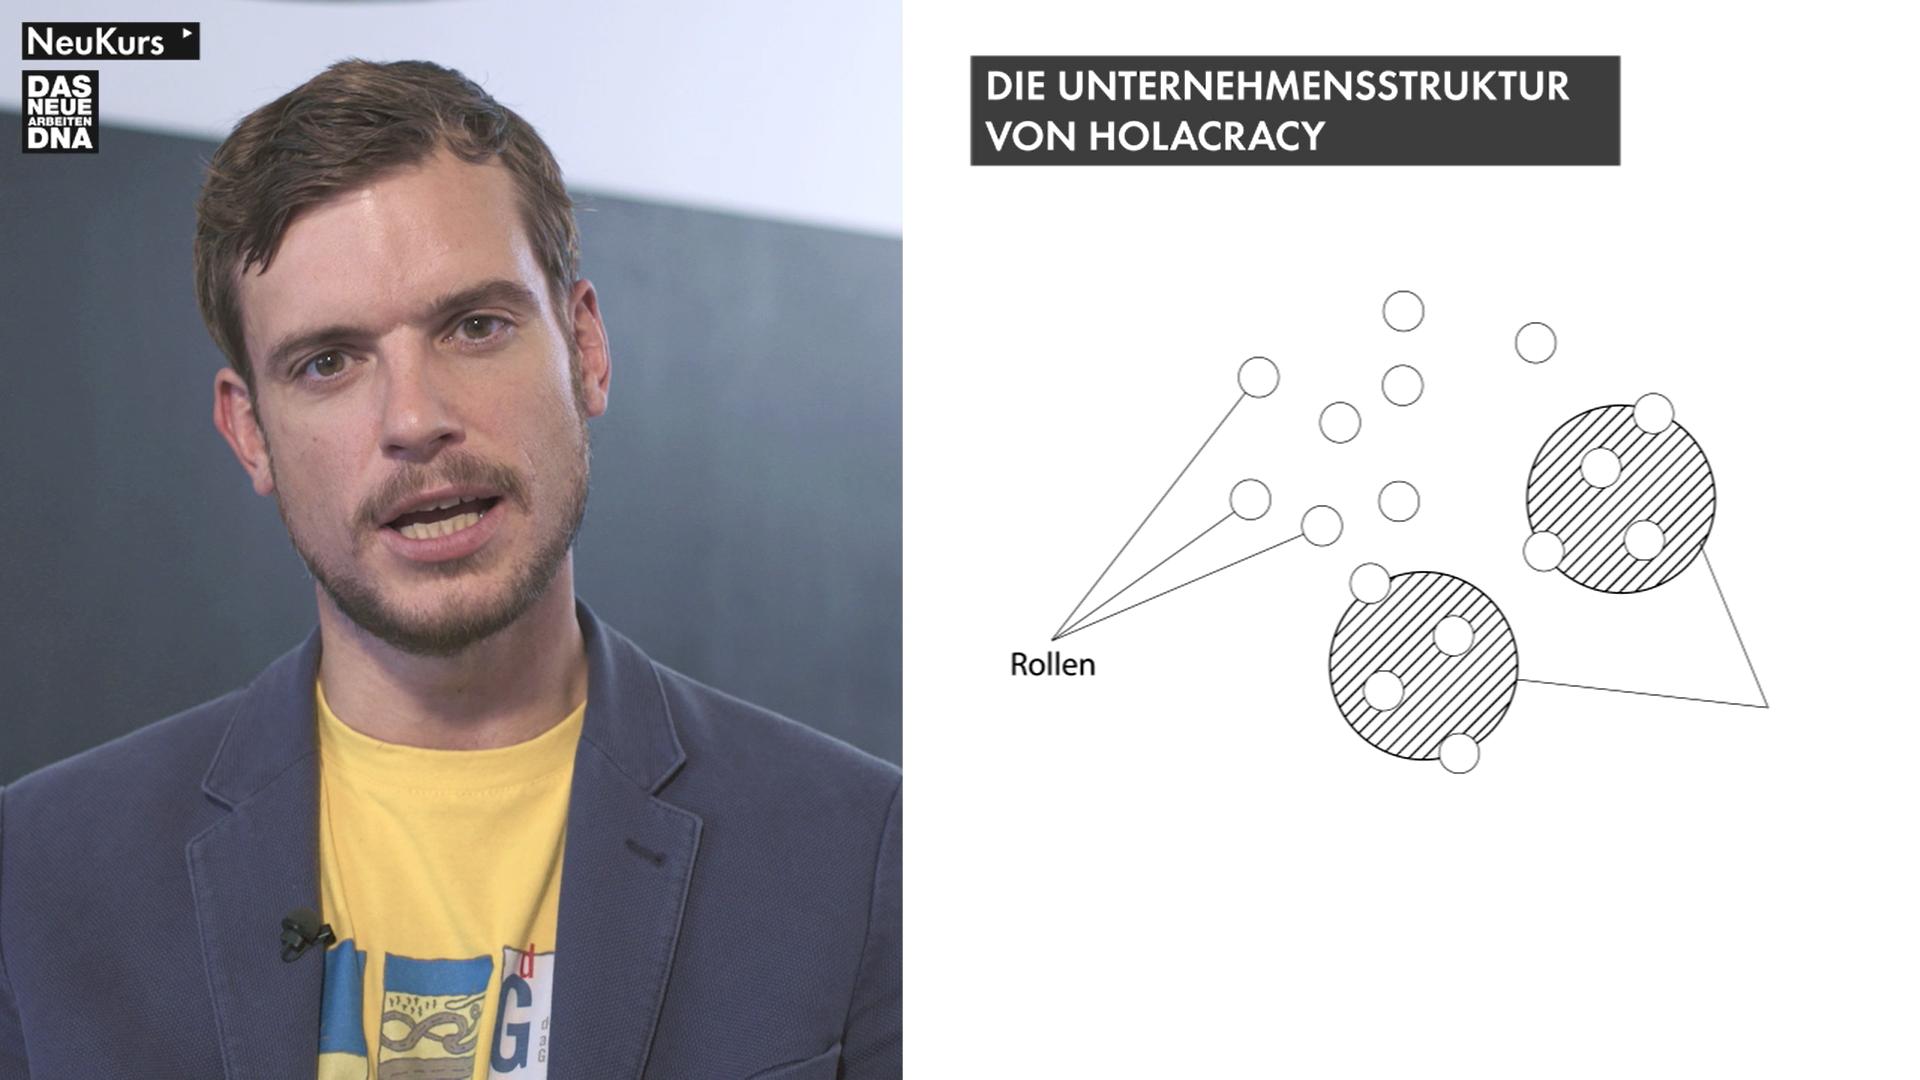 Stefan Faatz-Ferstl auf NeuKurs